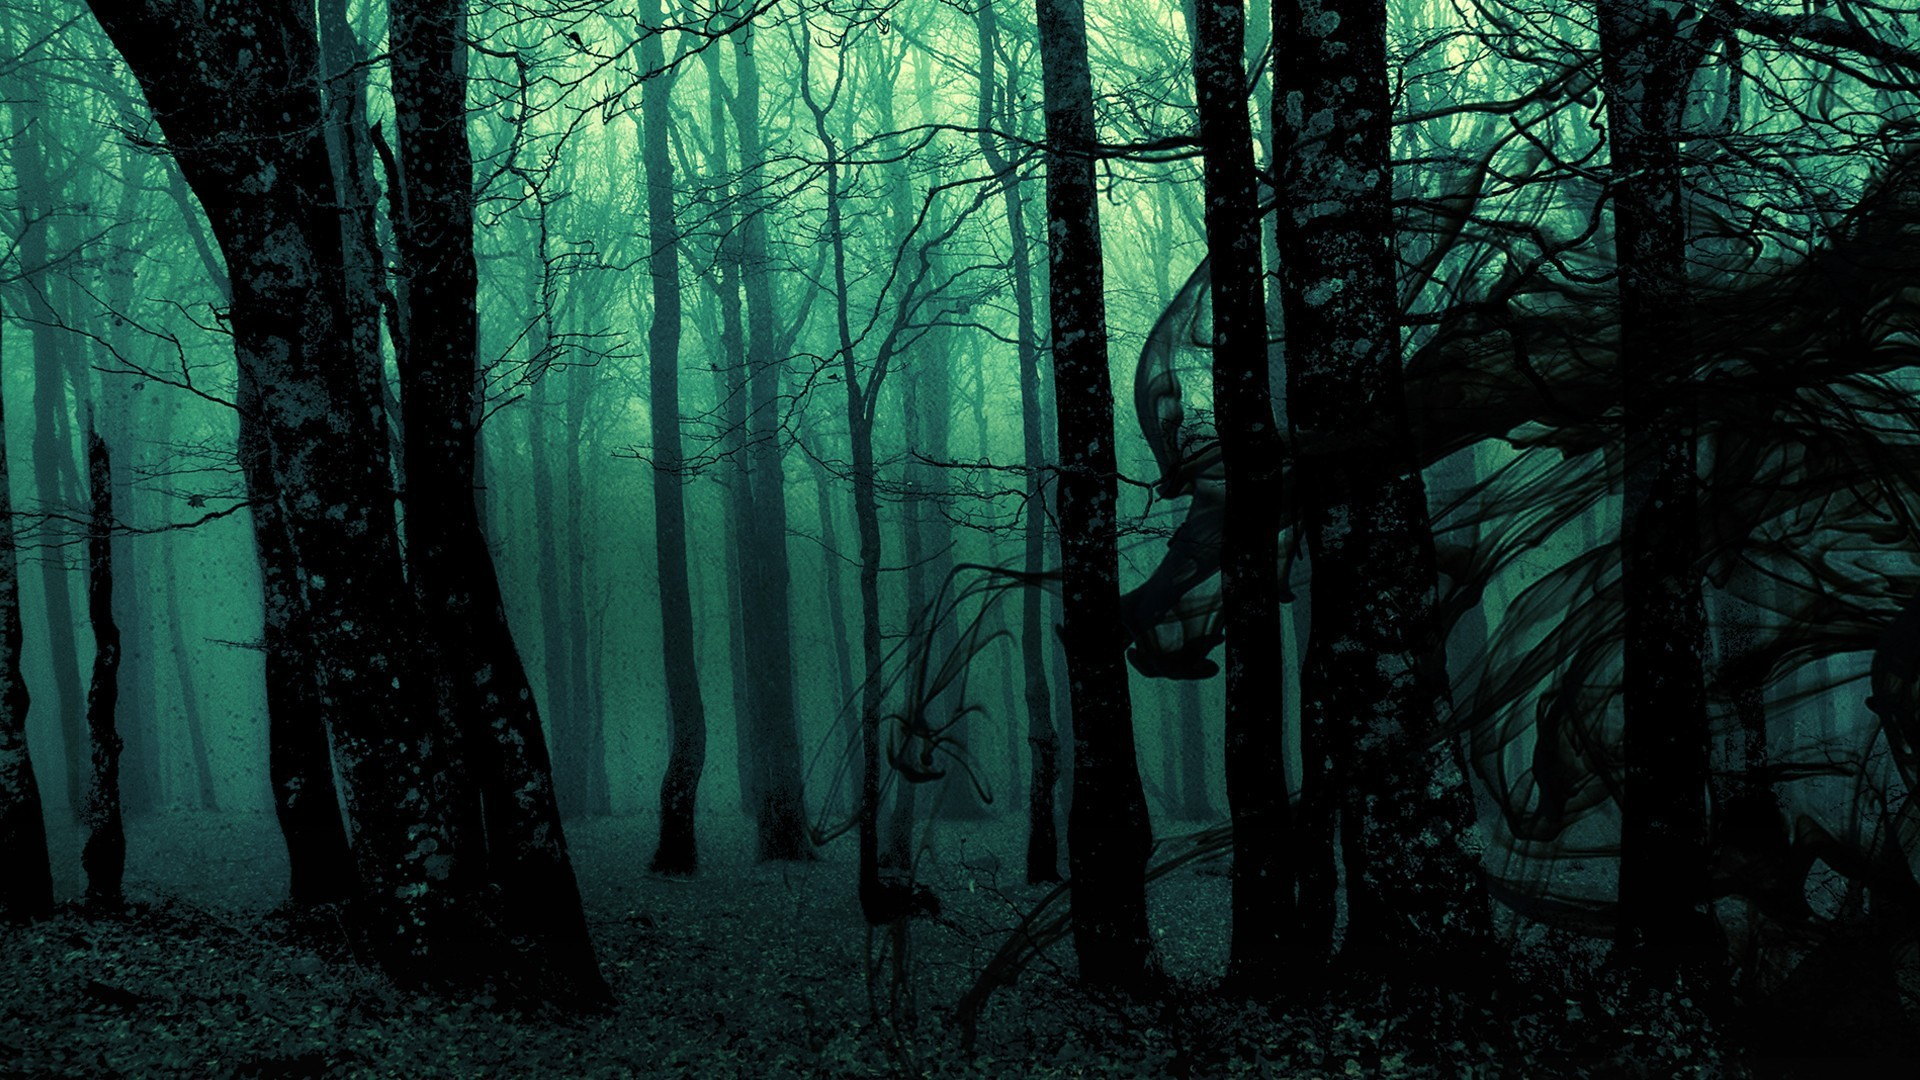 Dark ghost gothic wood trees fantasy evil horror wallpaper | |  118275 | WallpaperUP